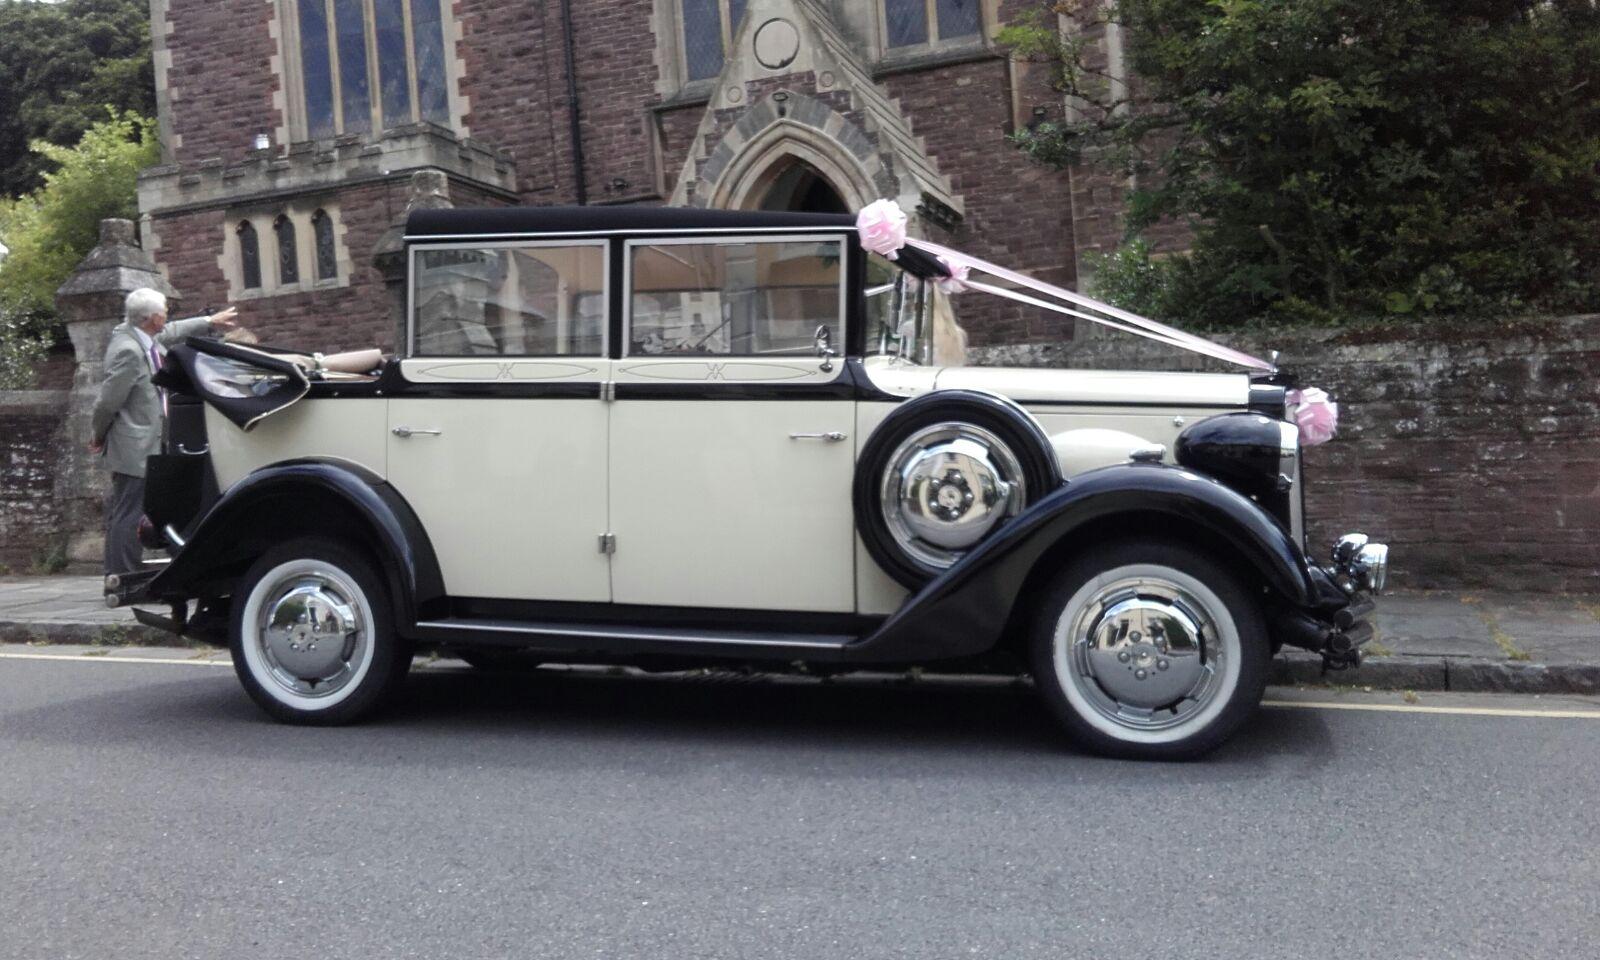 Bonnie Vintage Wedding Car hire